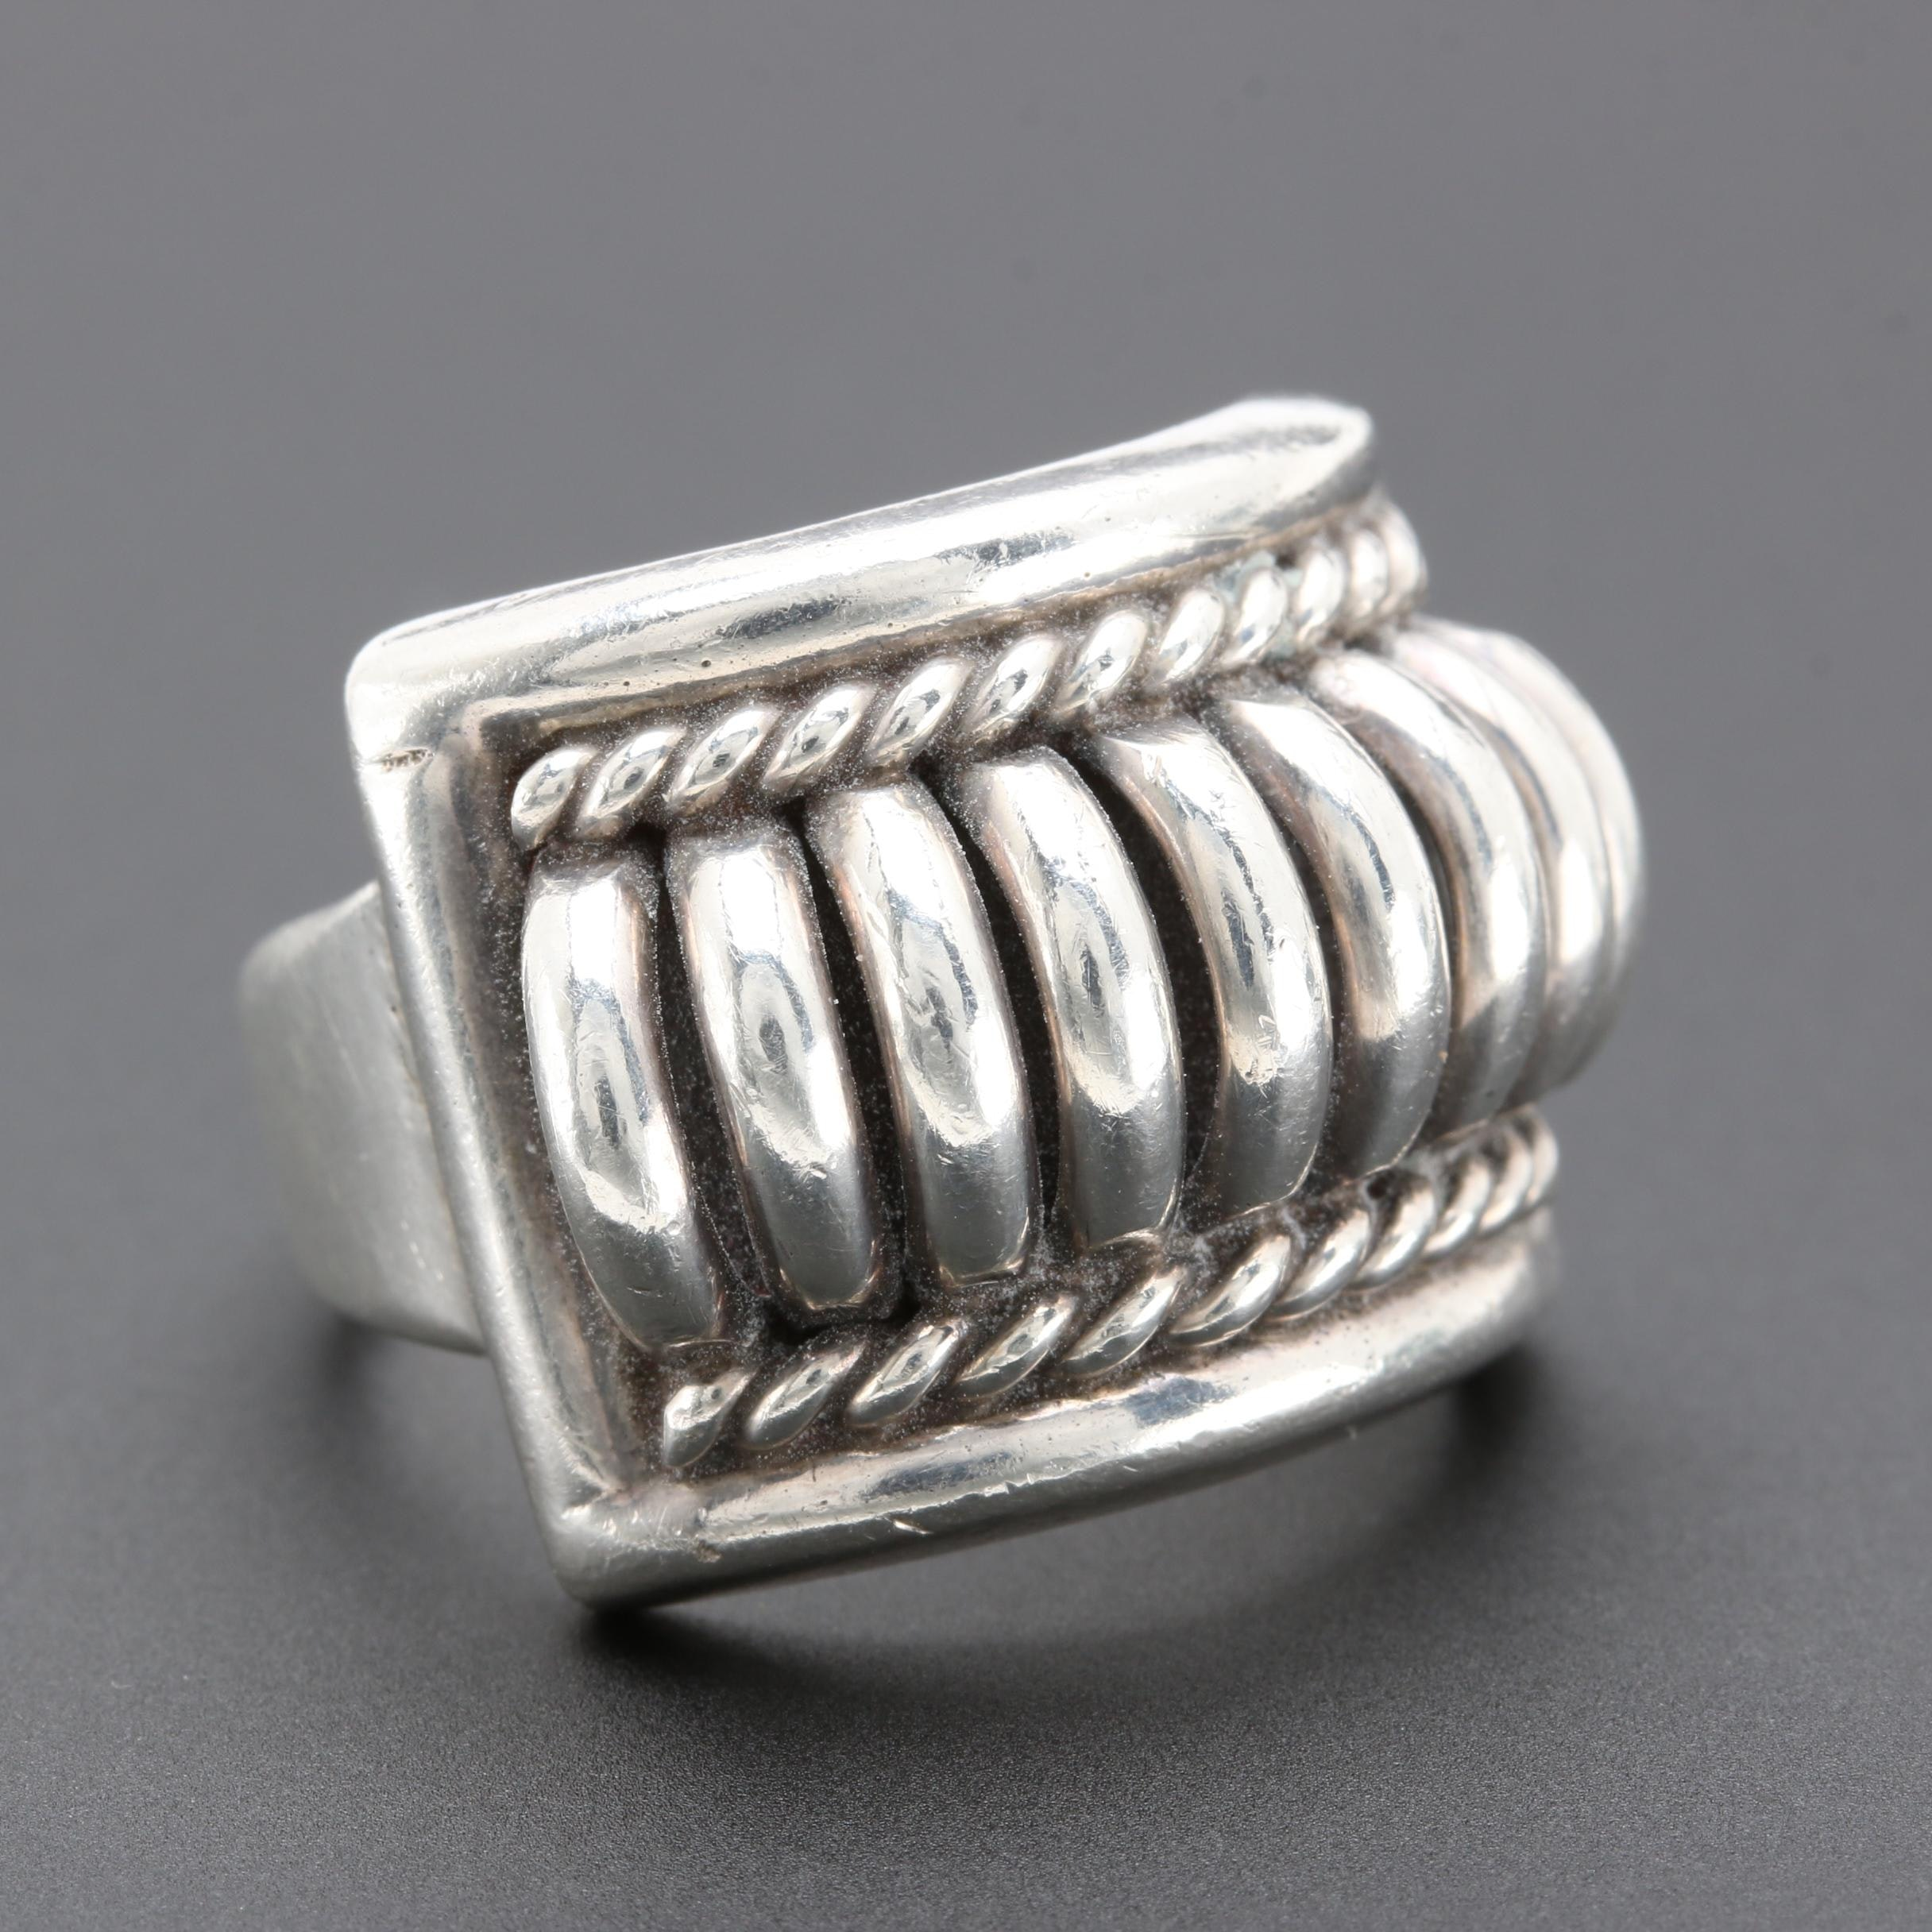 Tom Charley Navajo Diné Sterling Silver Ring